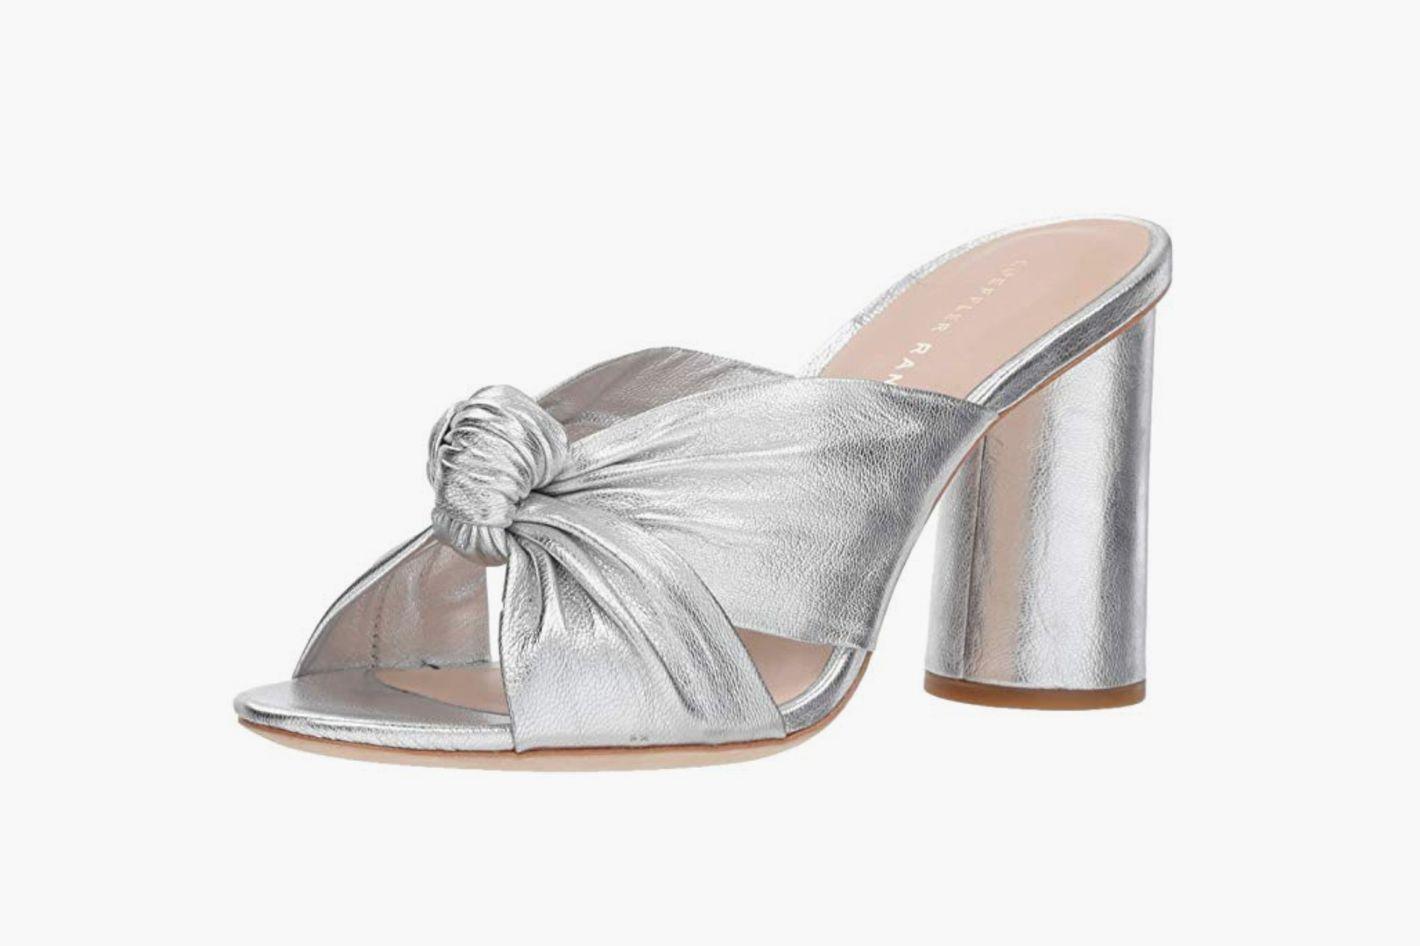 Loeffler Randall Women's Coco-MGT Heeled Sandal